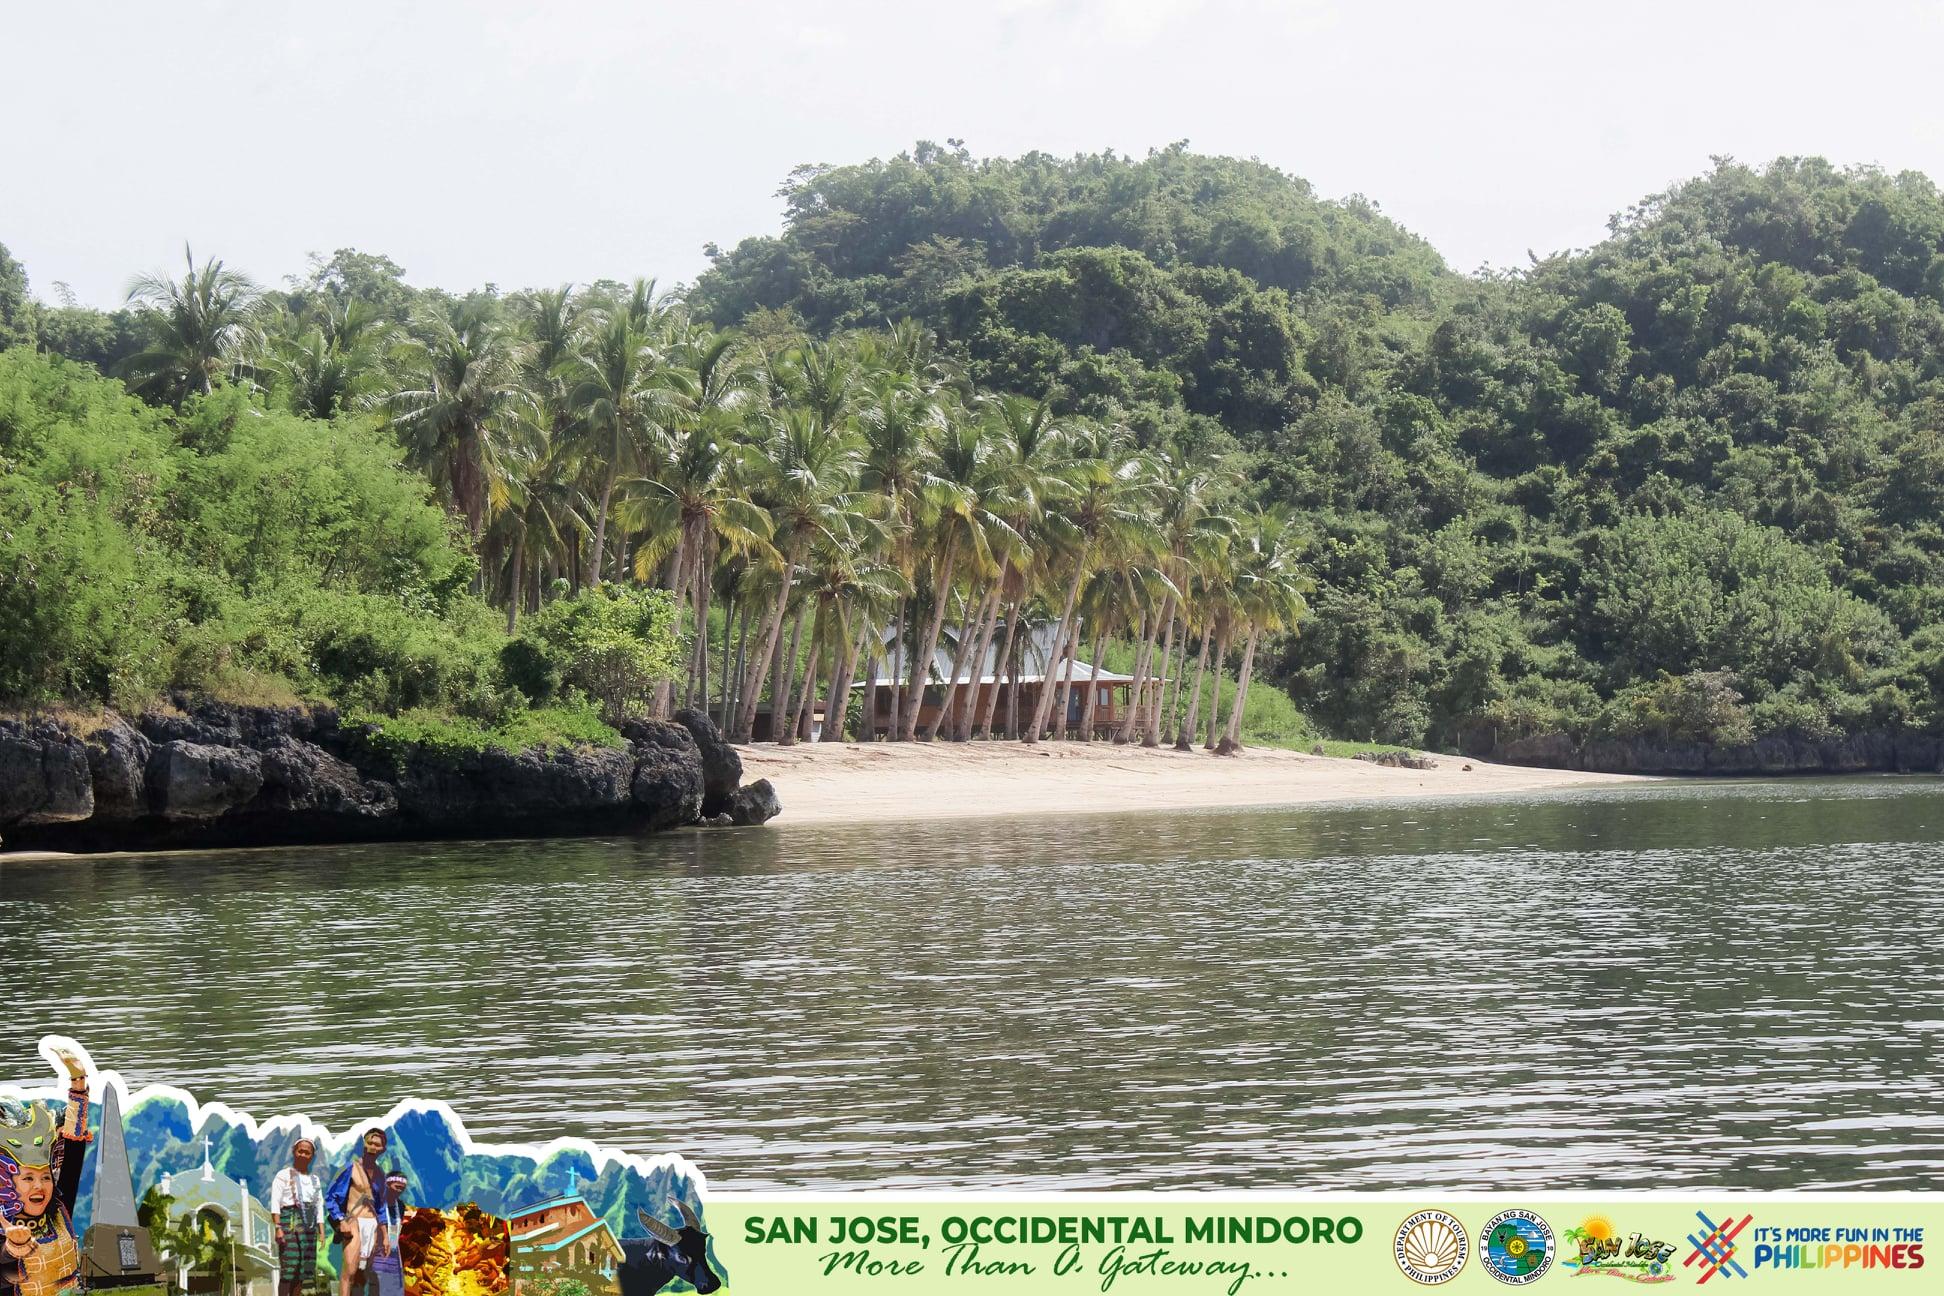 Ilin Island, San Jose, Occidental Mindoro